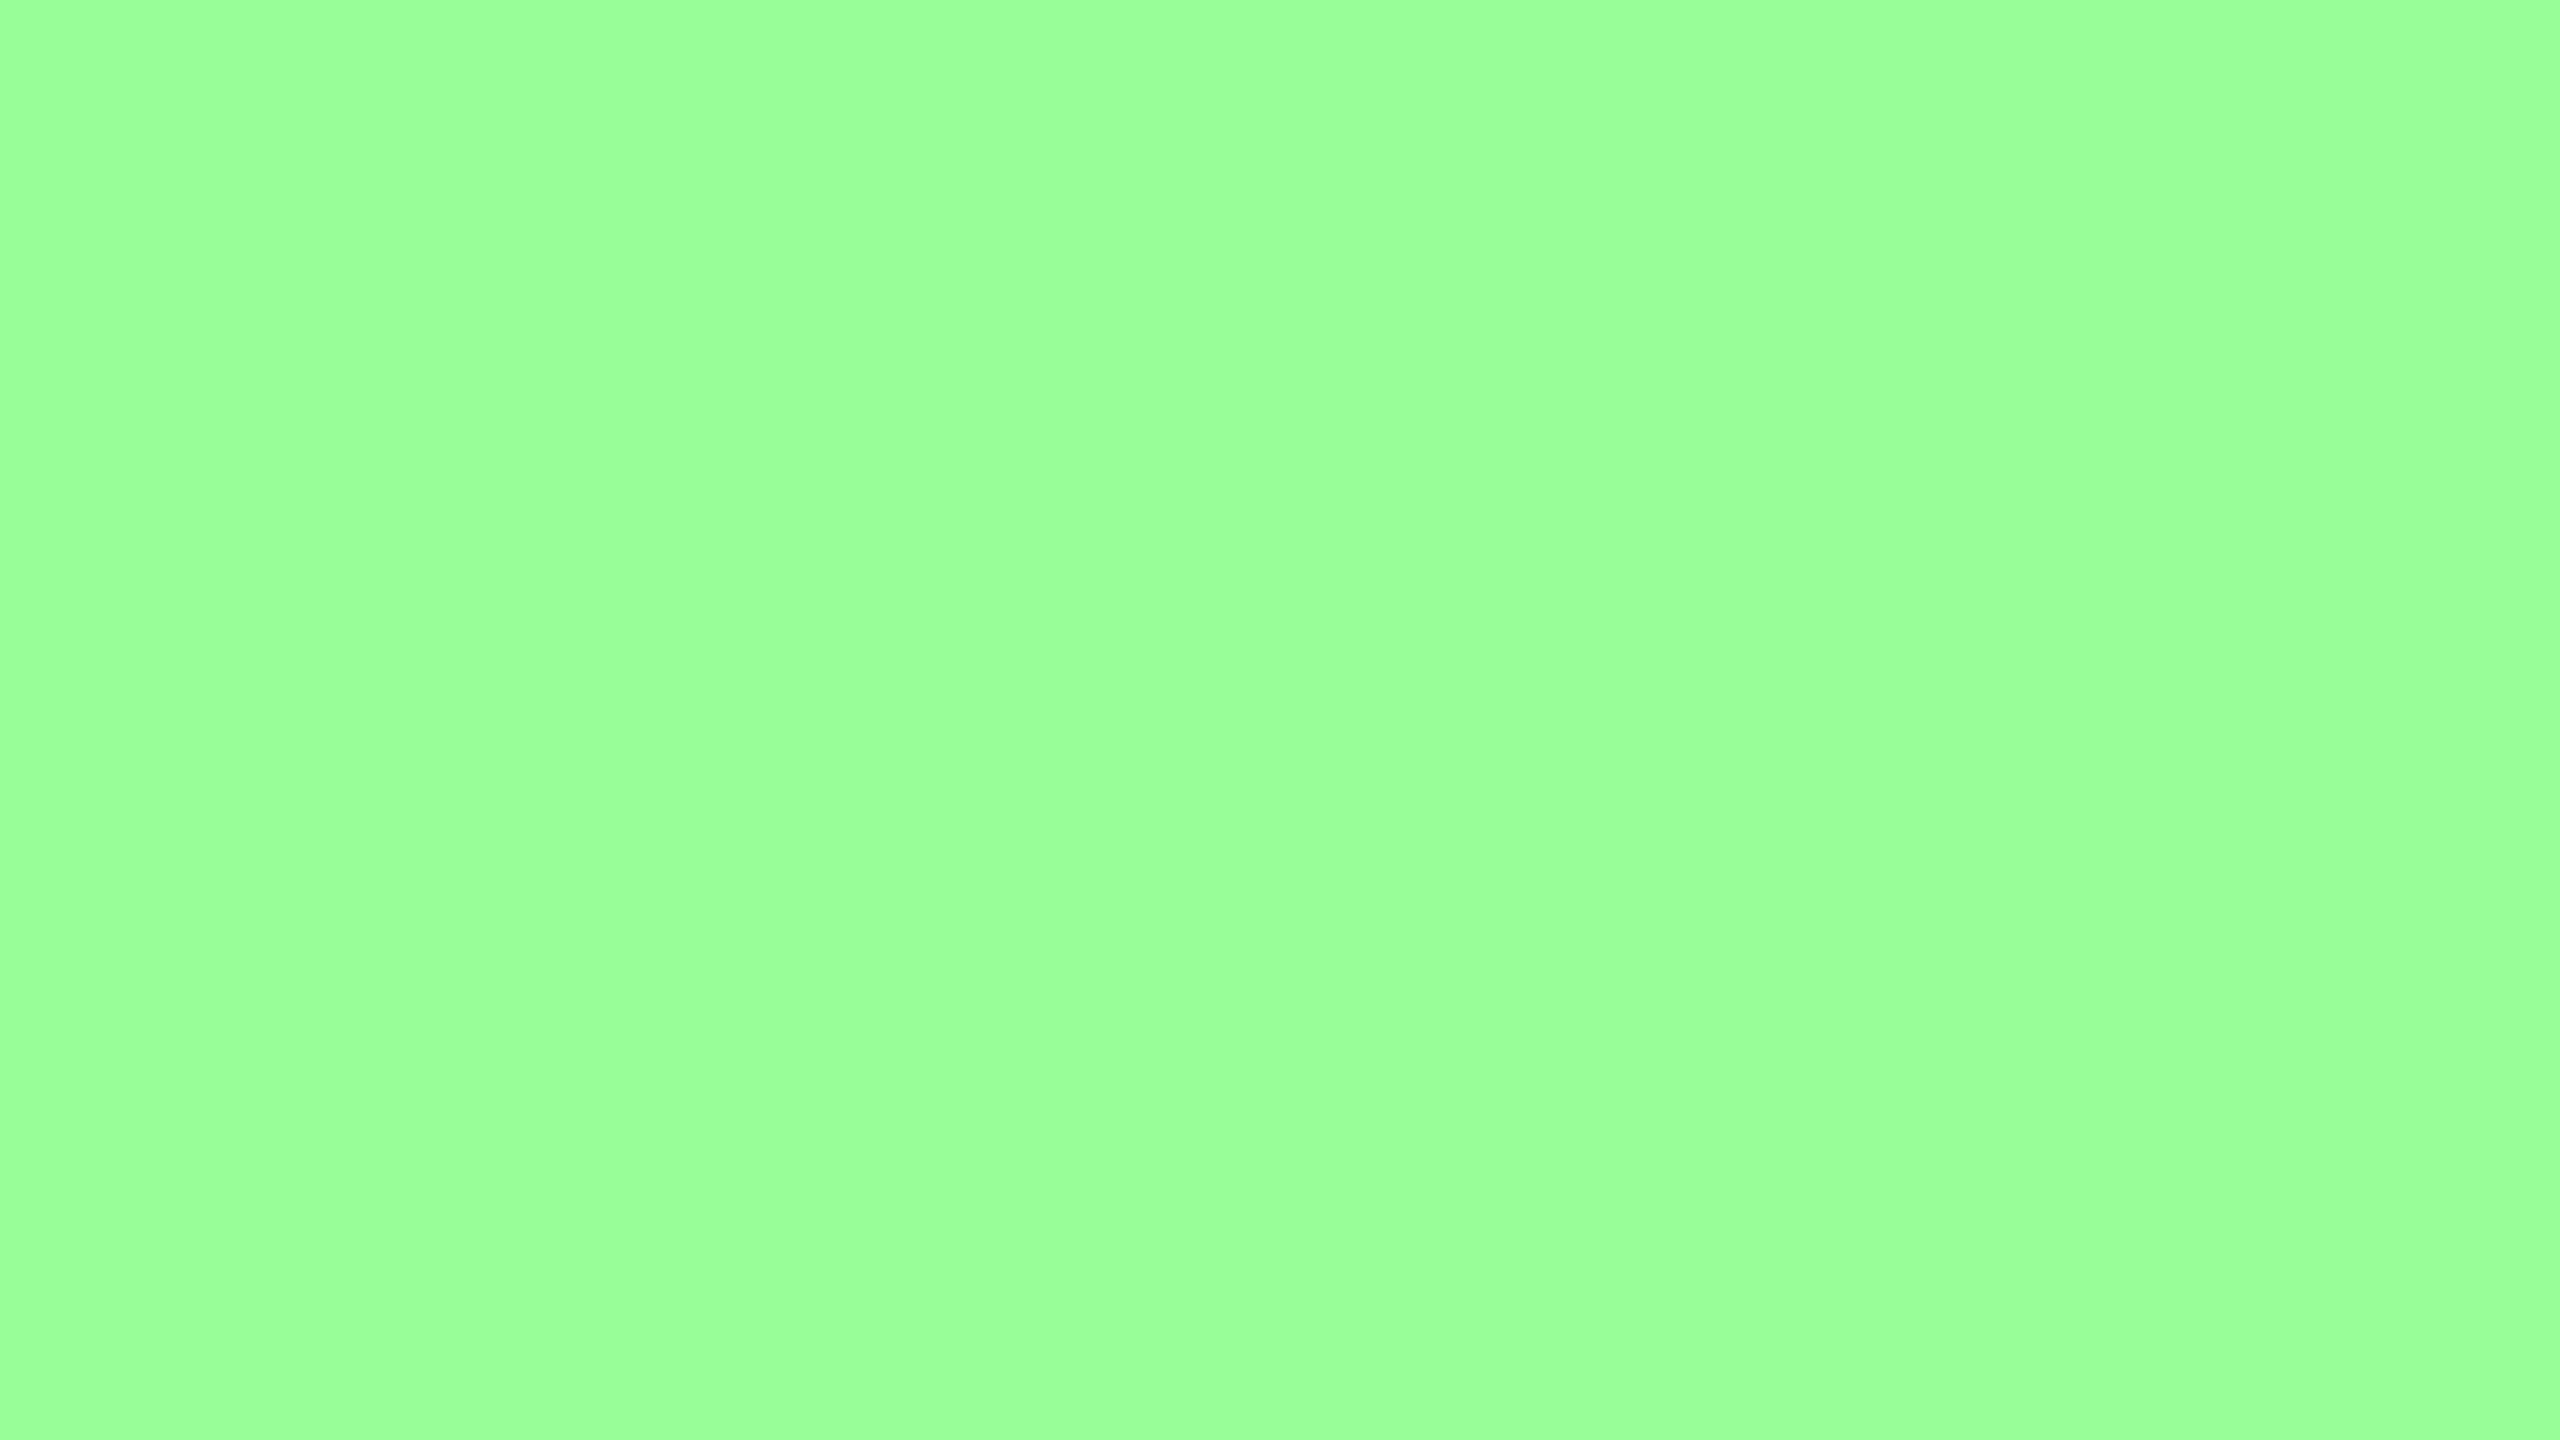 Mint green wallpaper wallpapersafari - Colors that match mint green ...